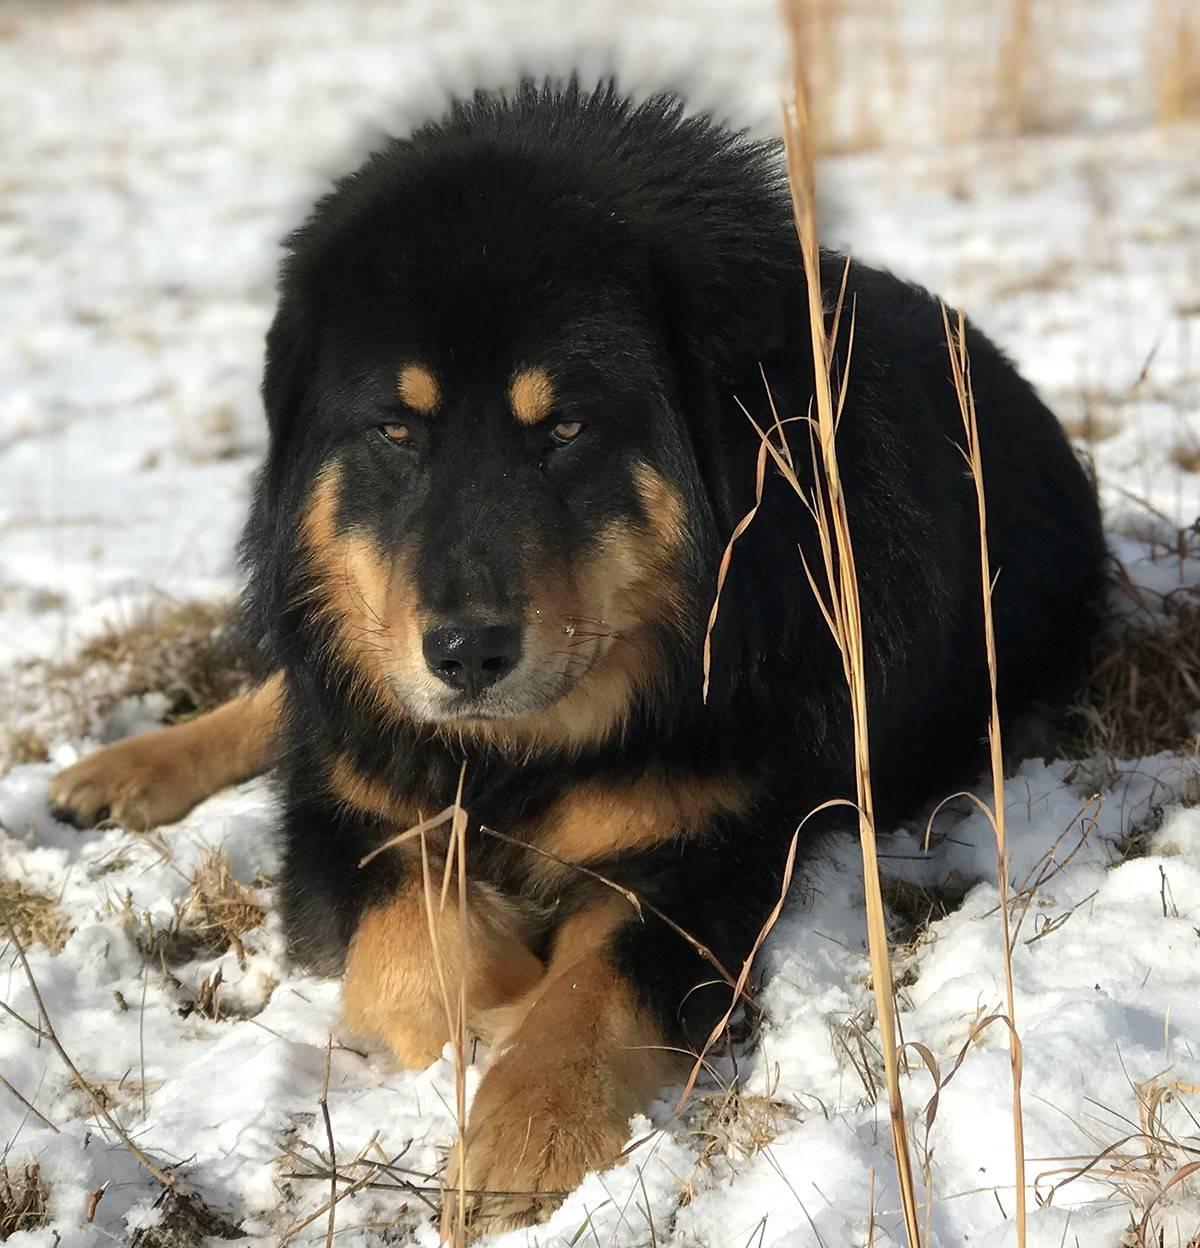 Бурят-монгольский волкодав (хоттошо)